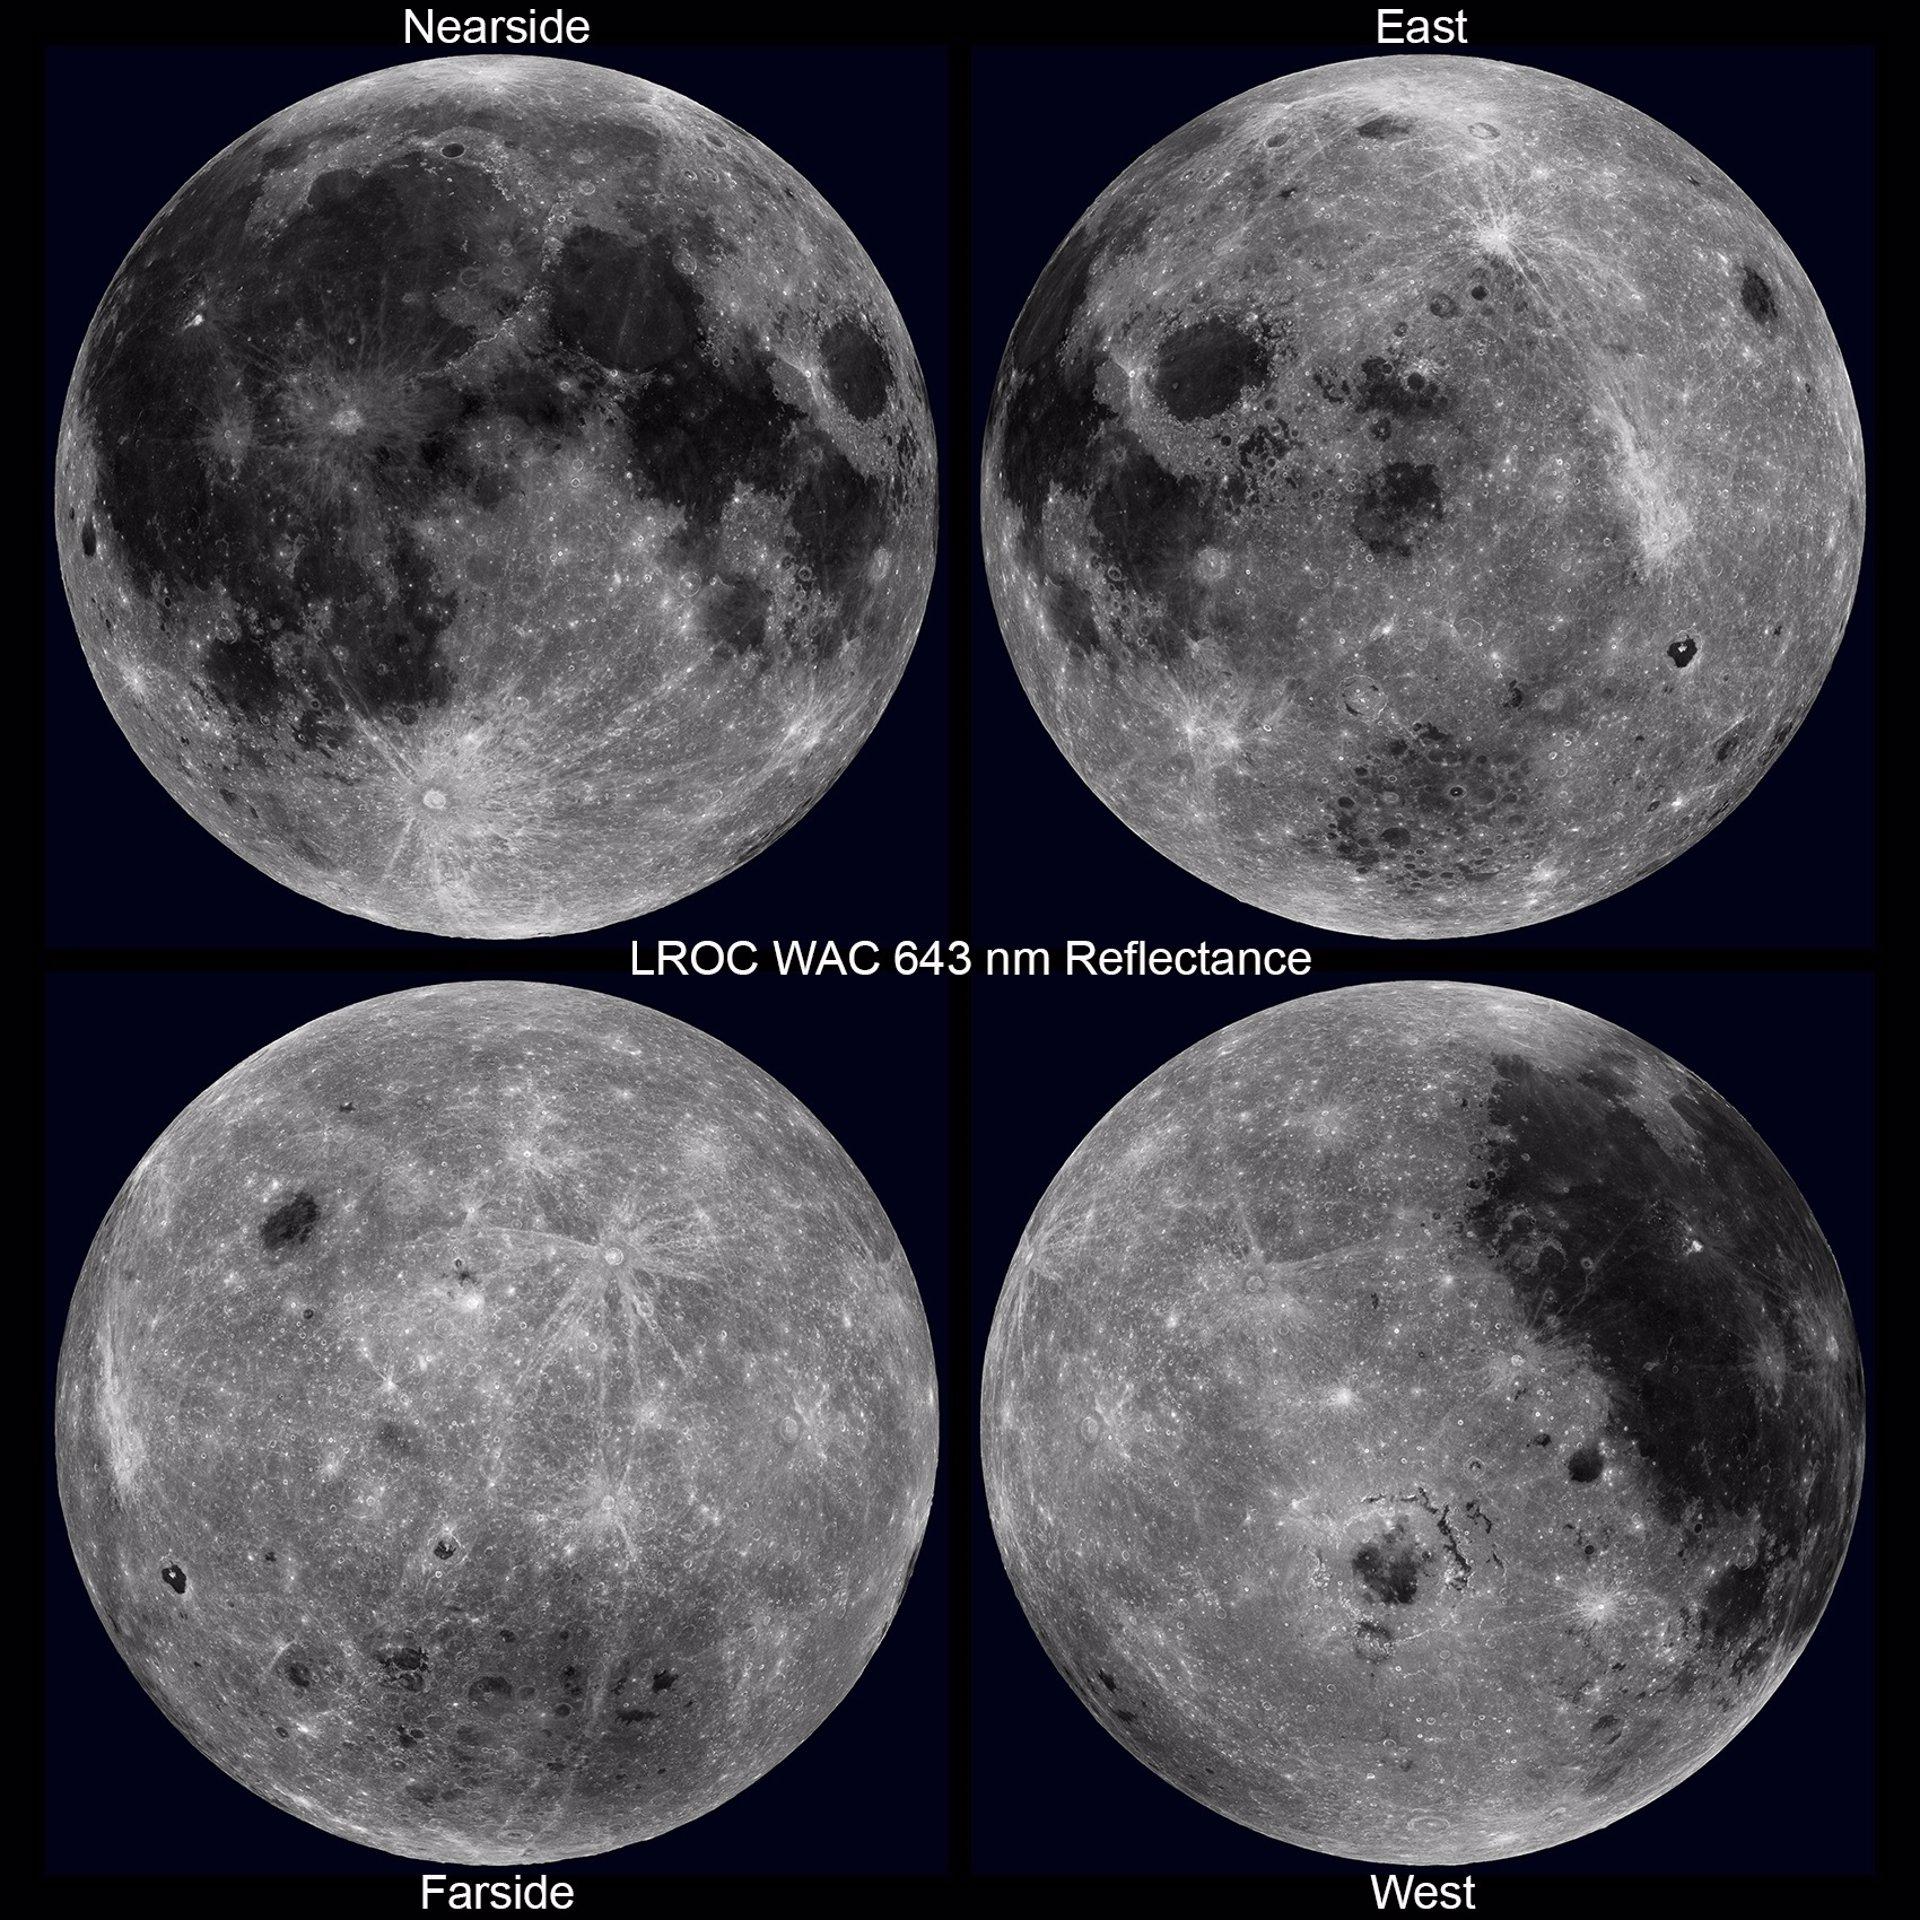 Una Visi U00f3n  U00fanica De La Luna  En Rotaci U00f3n